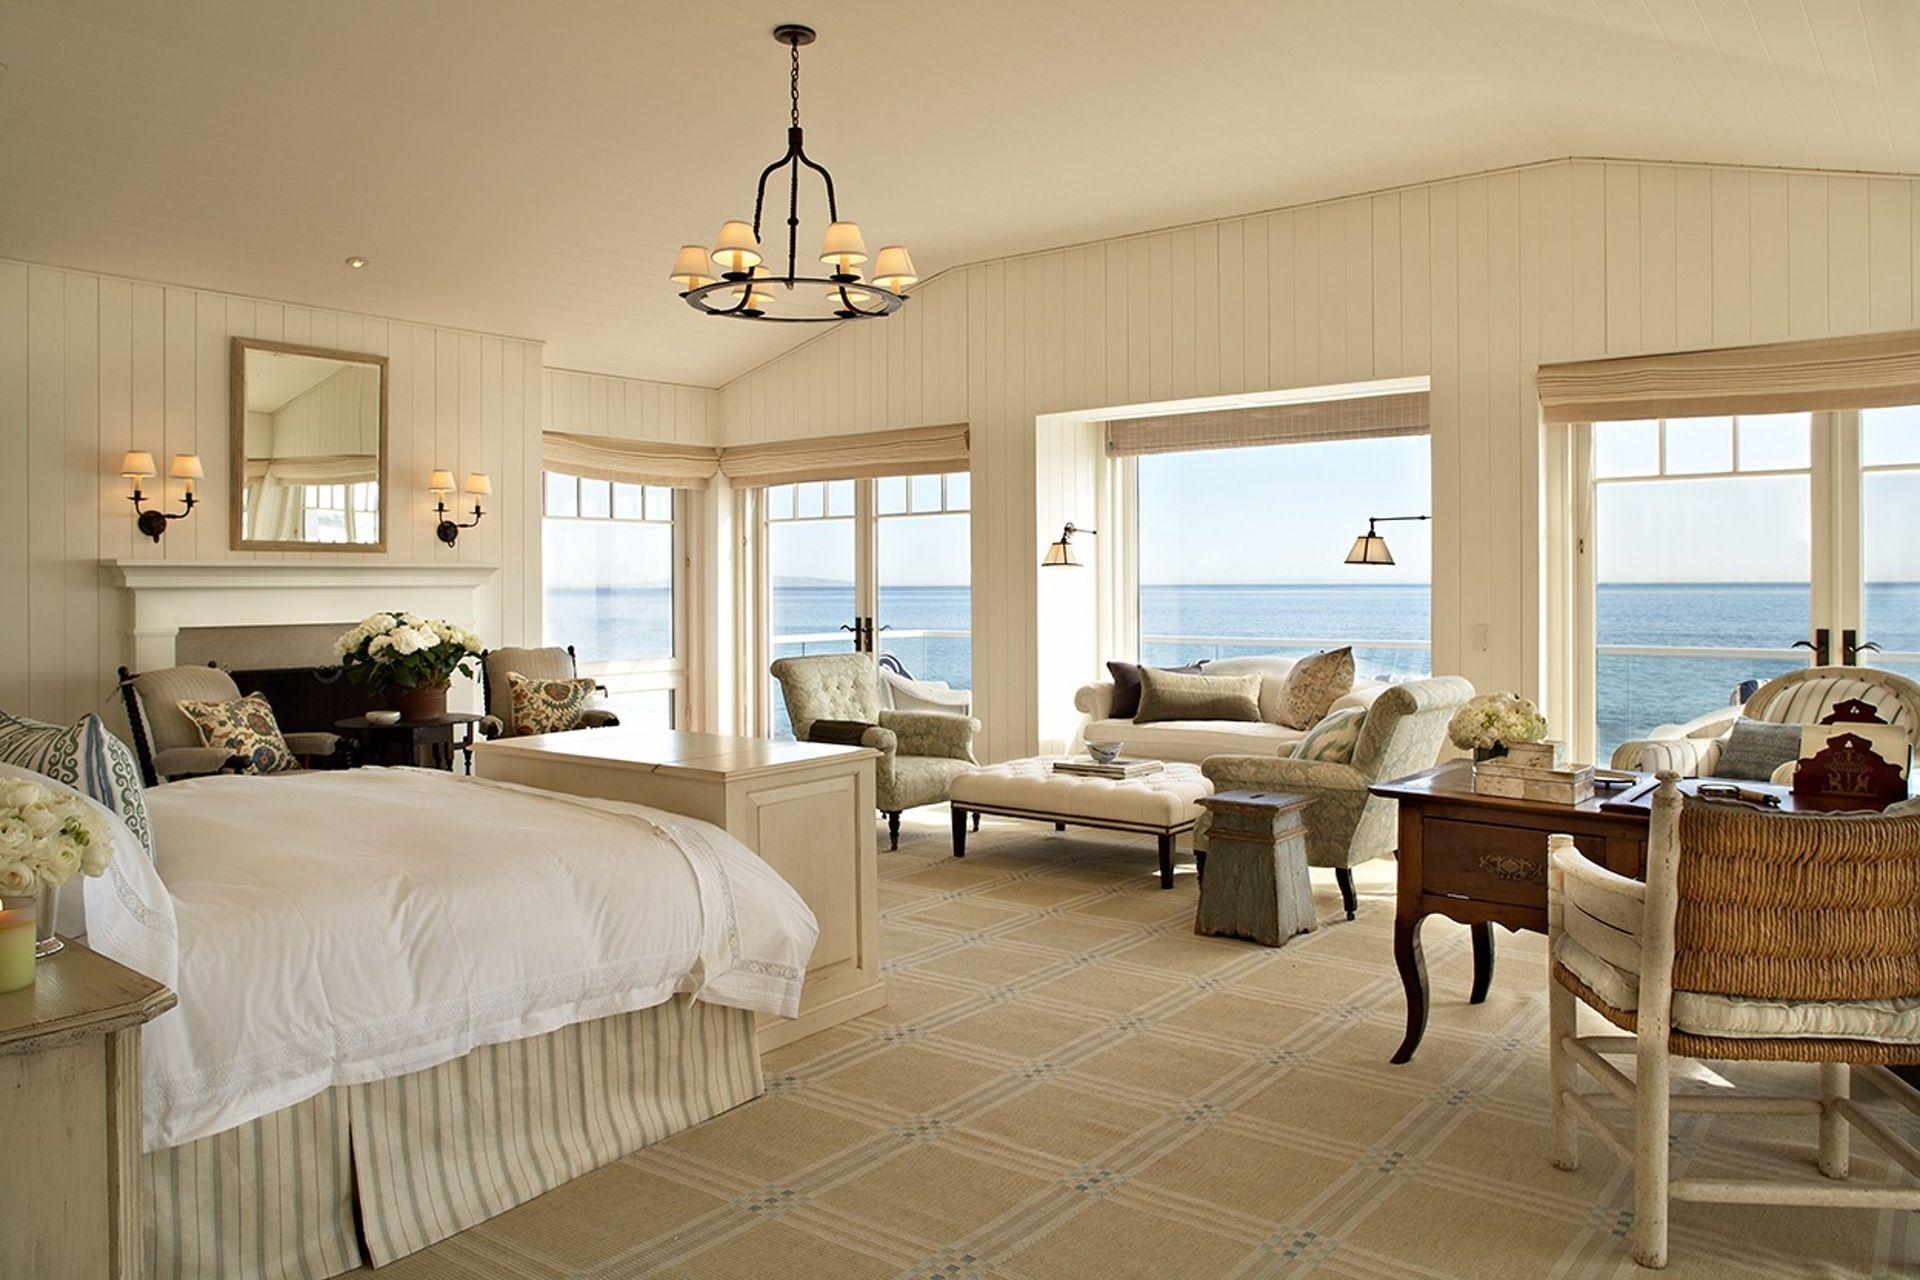 David phoenix portfolio interiors traditional beachcoastal transitional bedroom.jpg?ixlib=rails 1.1